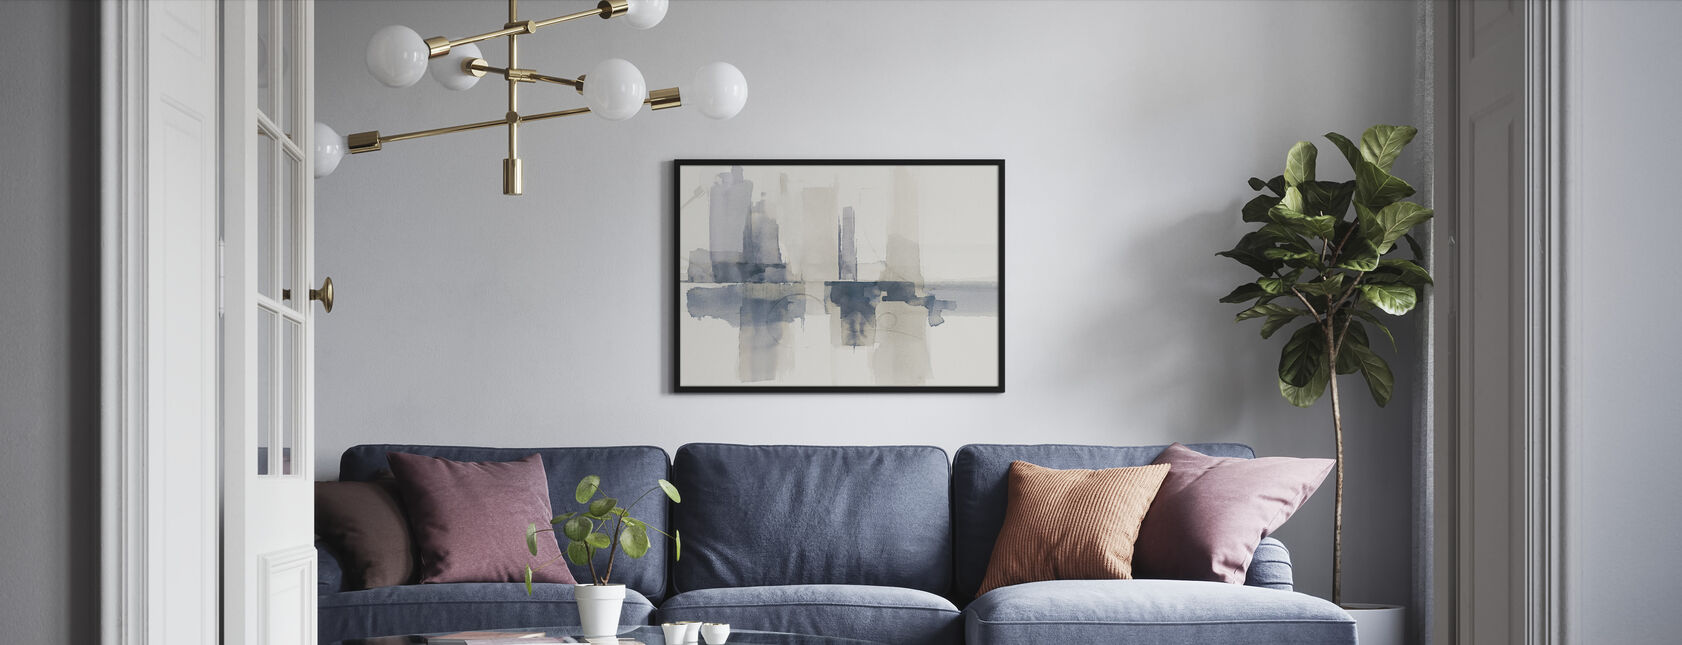 Improvisation II Navy - Framed print - Living Room